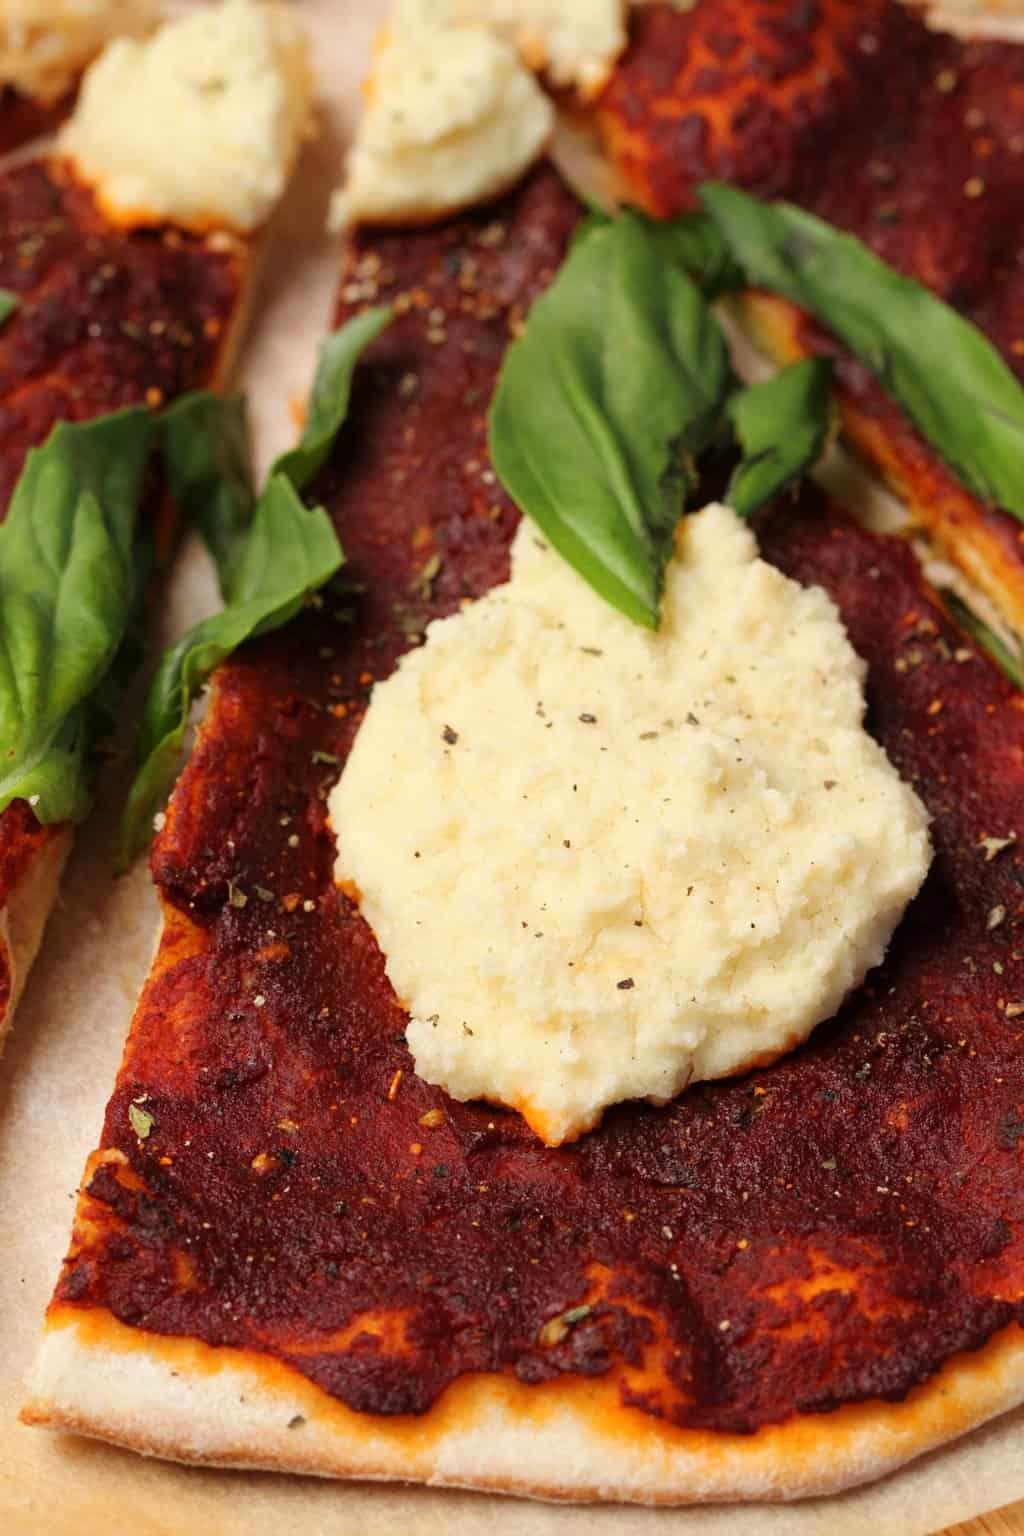 Vegan pizza topped with fresh basil and vegan ricotta.